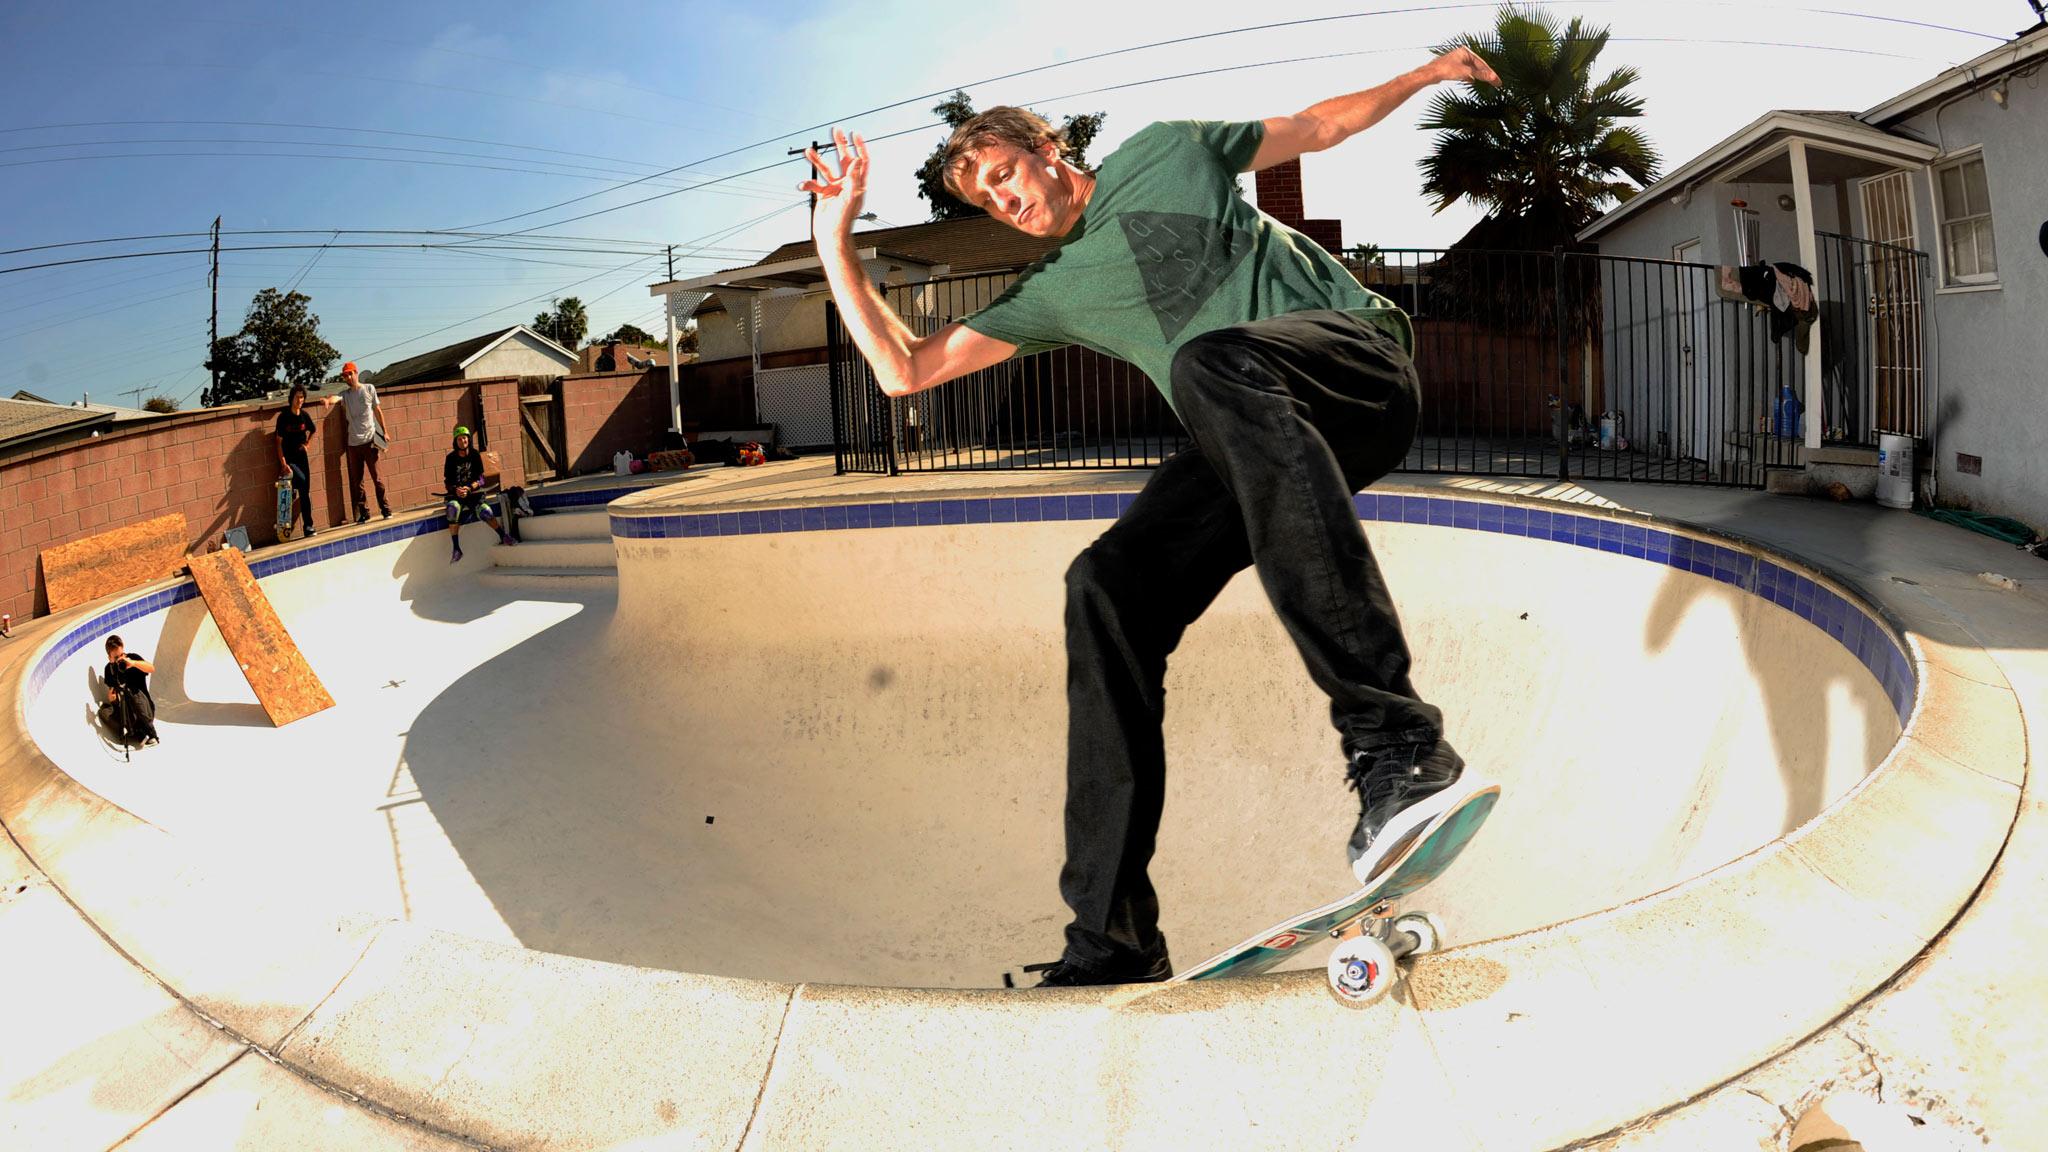 Skateboarding Cool Bowl Tricks